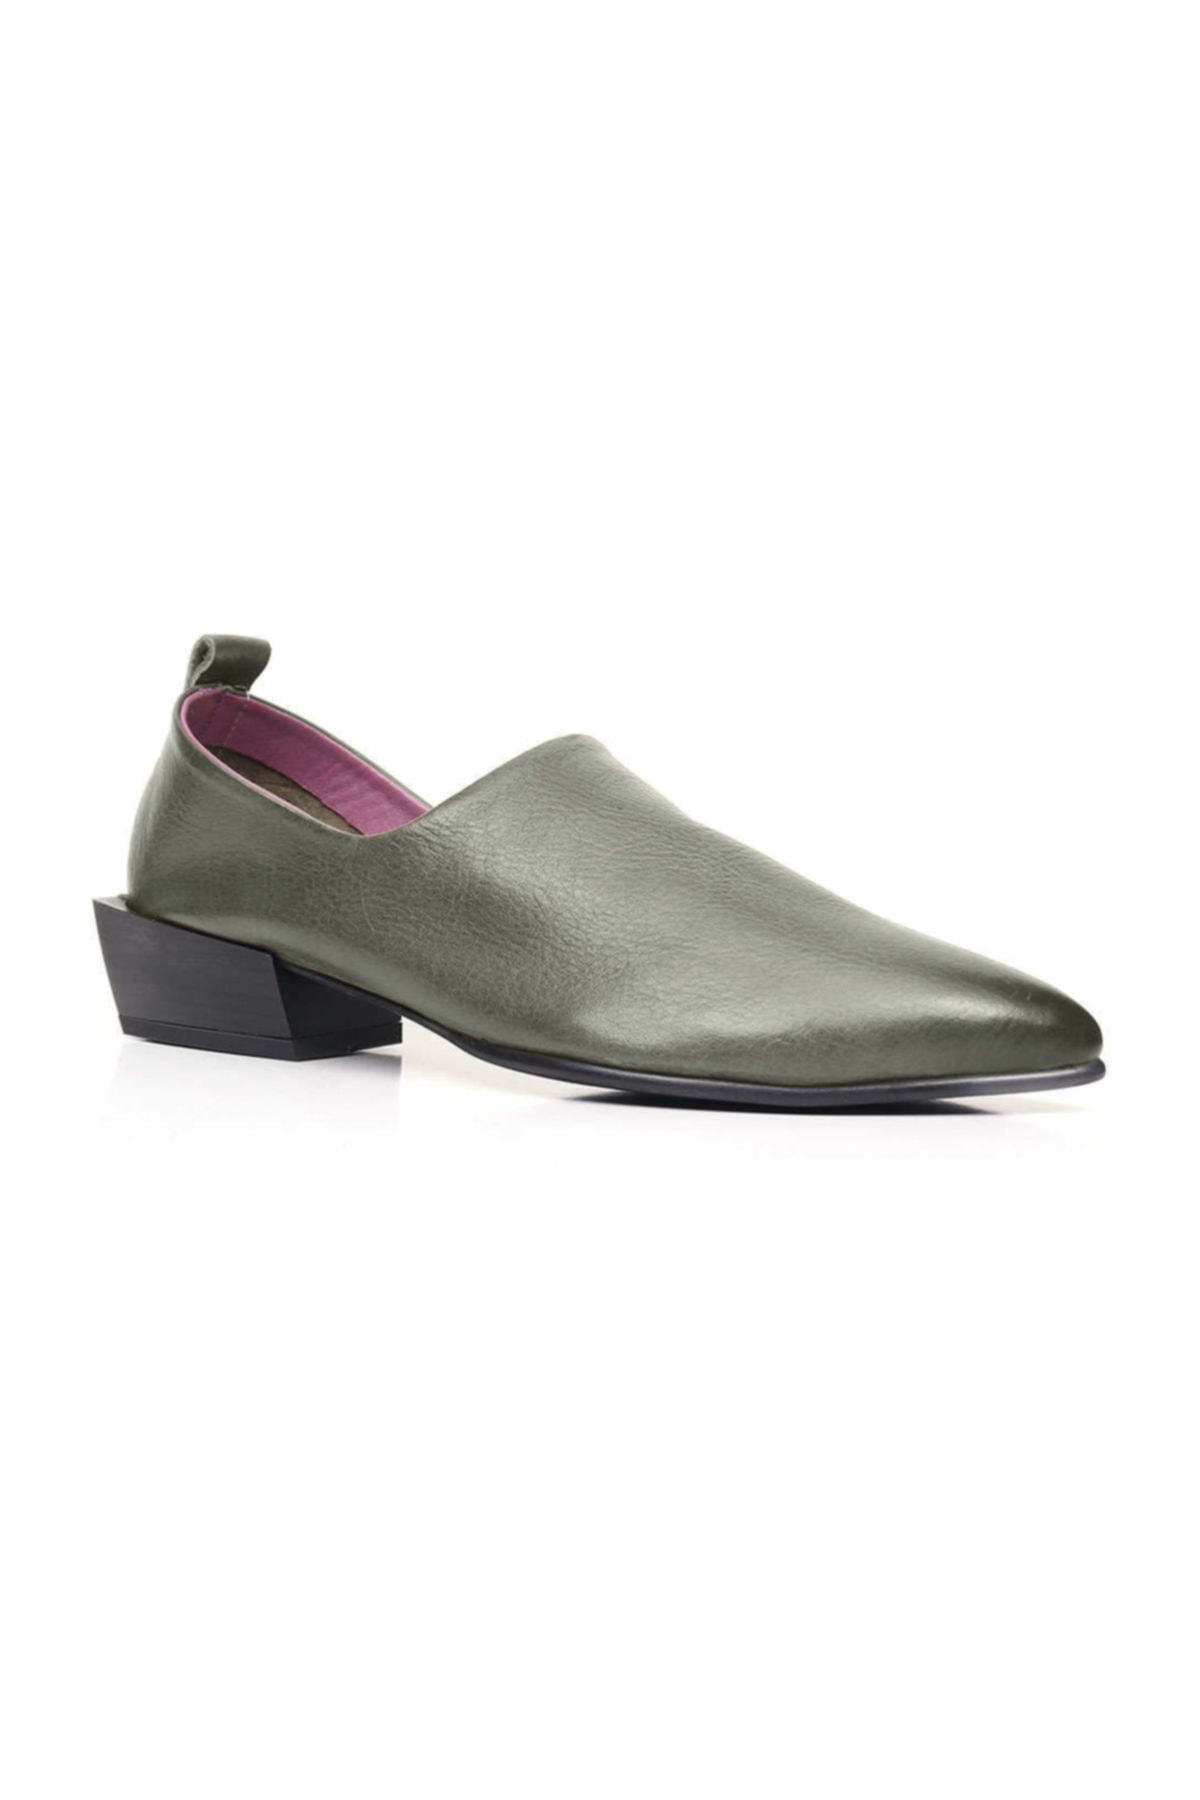 BUENO Shoes  Kadın Ayakkabı 9p7112 1